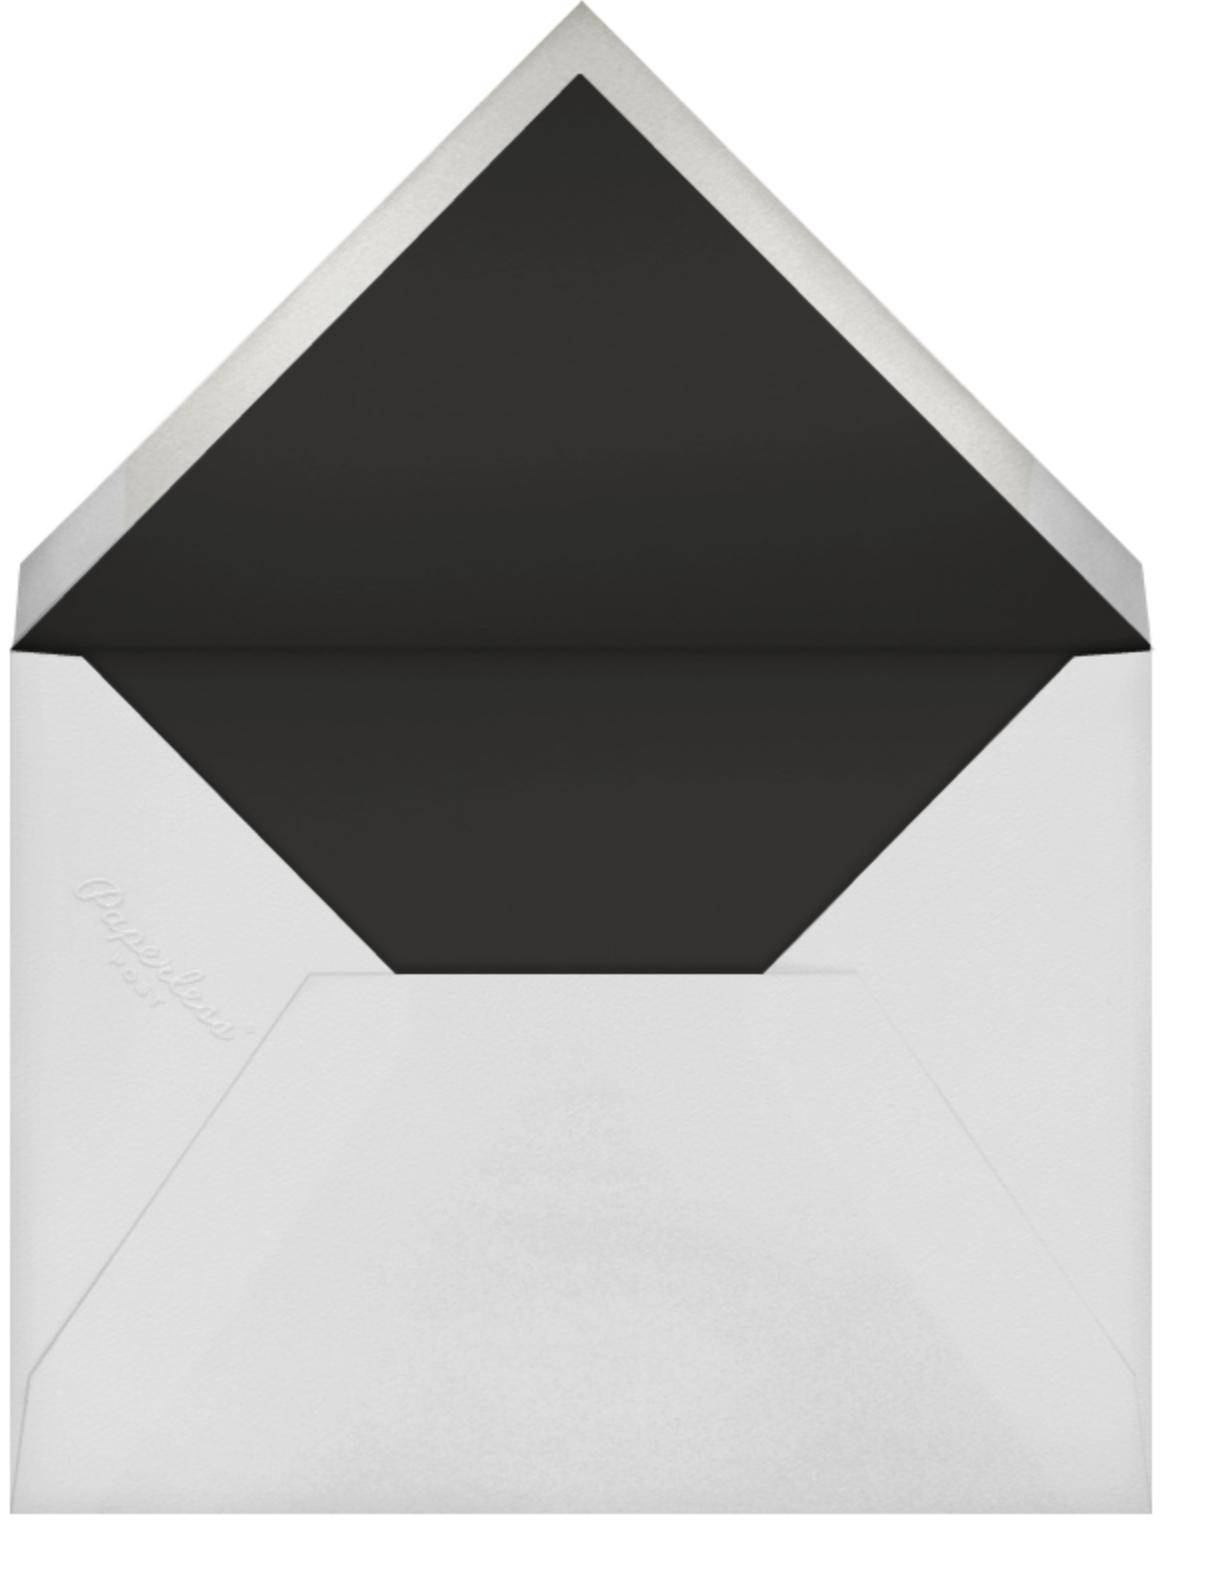 Richmond Park (Save the Date) - Pink/Silver - Oscar de la Renta - Save the date - envelope back